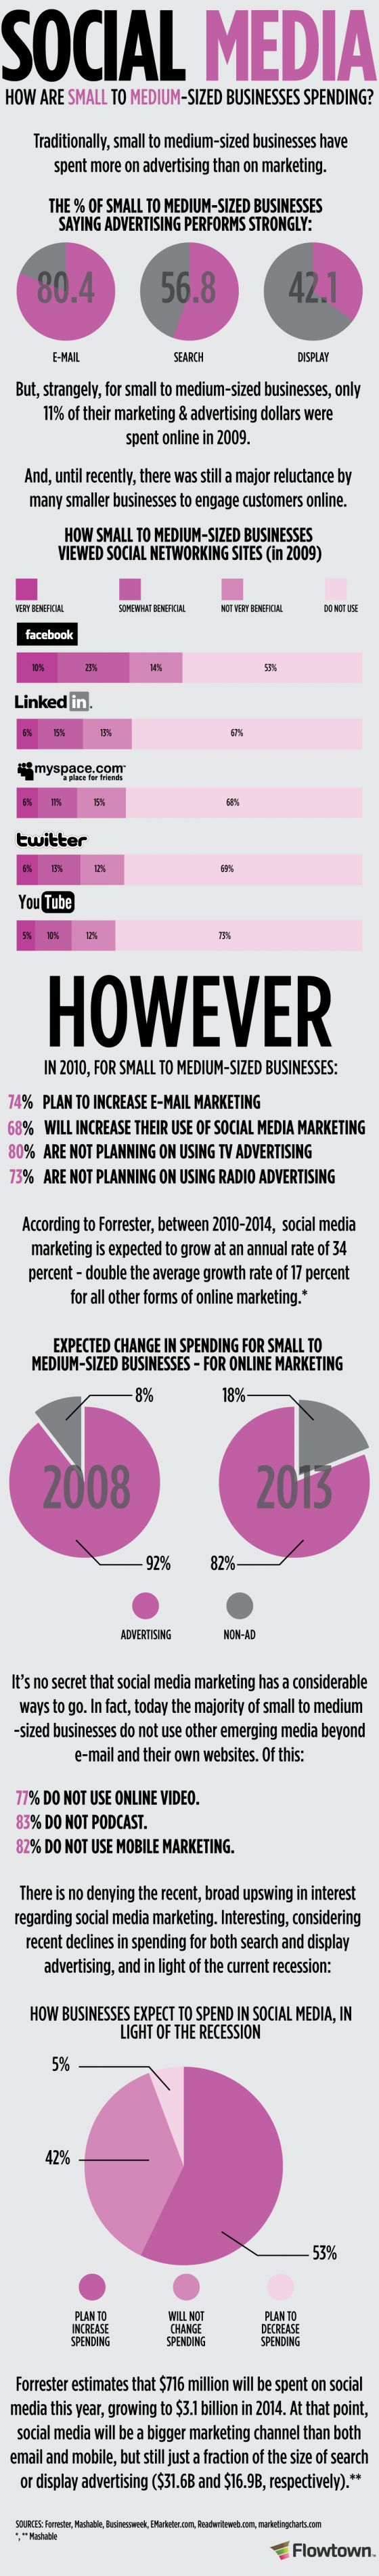 infographics: Media Infographics, Internet Marketing, Social Media Marketing, Media Dollars, Medium Sized Businesses, Medium Business, Small Businesses, Socialmedia, Businesses Spending